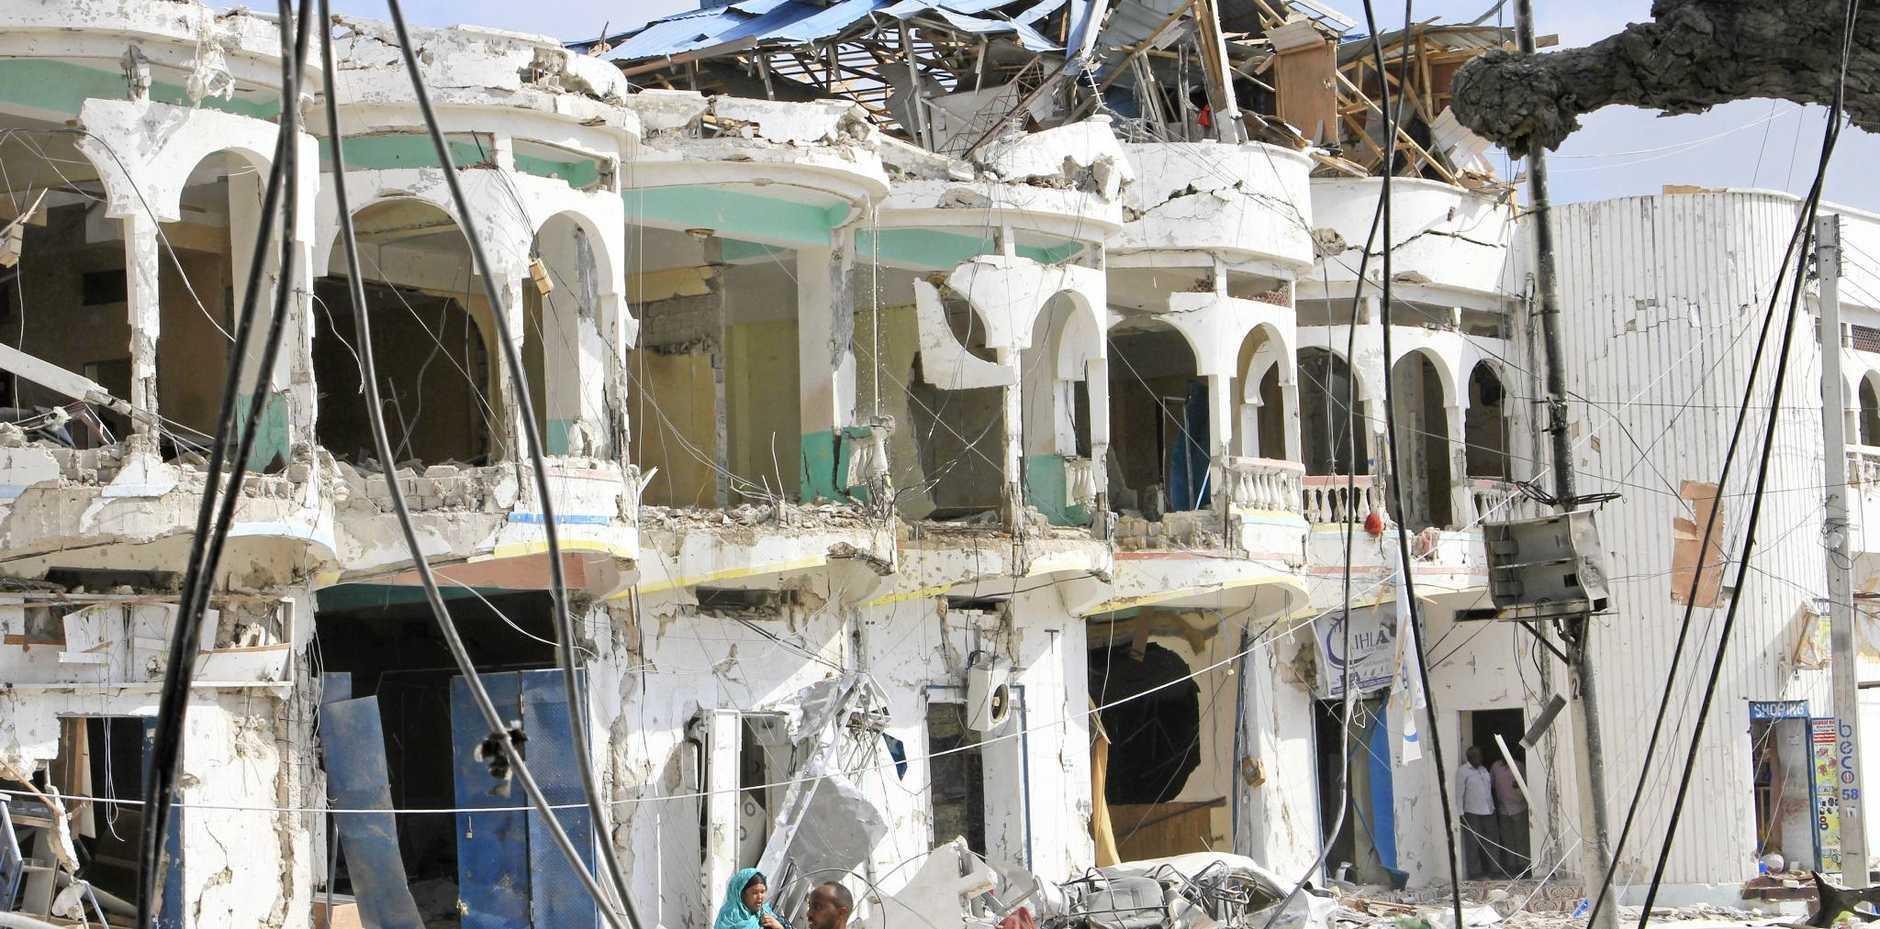 Somalis walk near a hotel heavily damaged by a car bomb blast in Mogadishu.